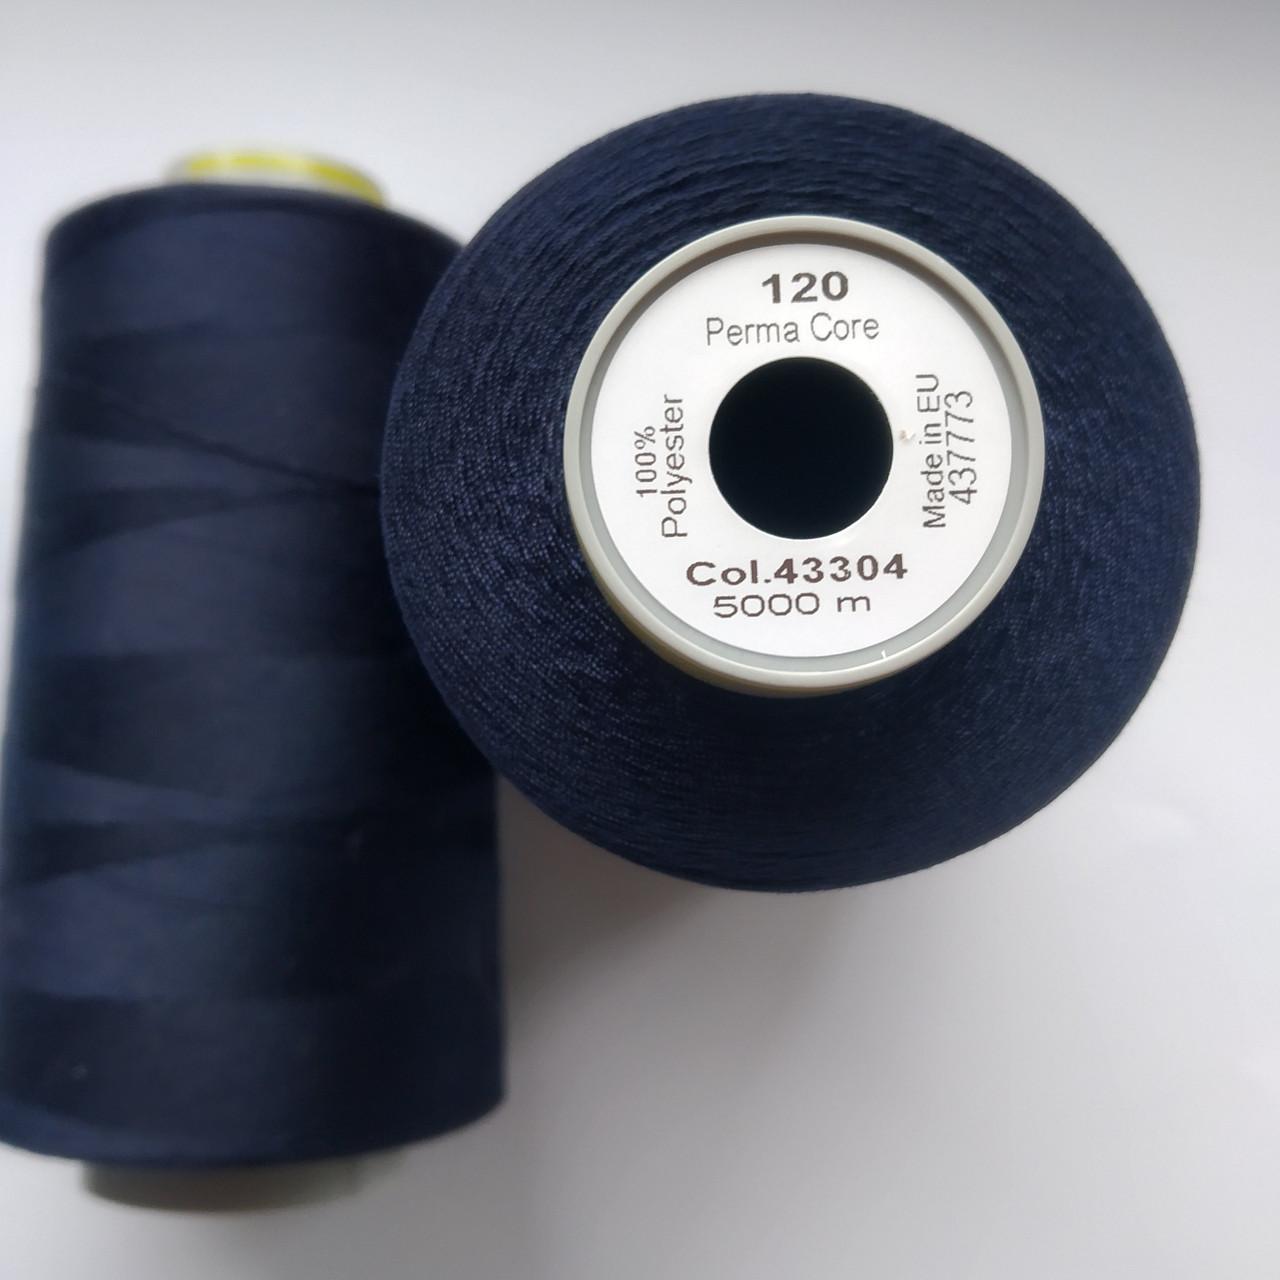 Нитки Gutermann Perma Core 120 col 32021 темно синій